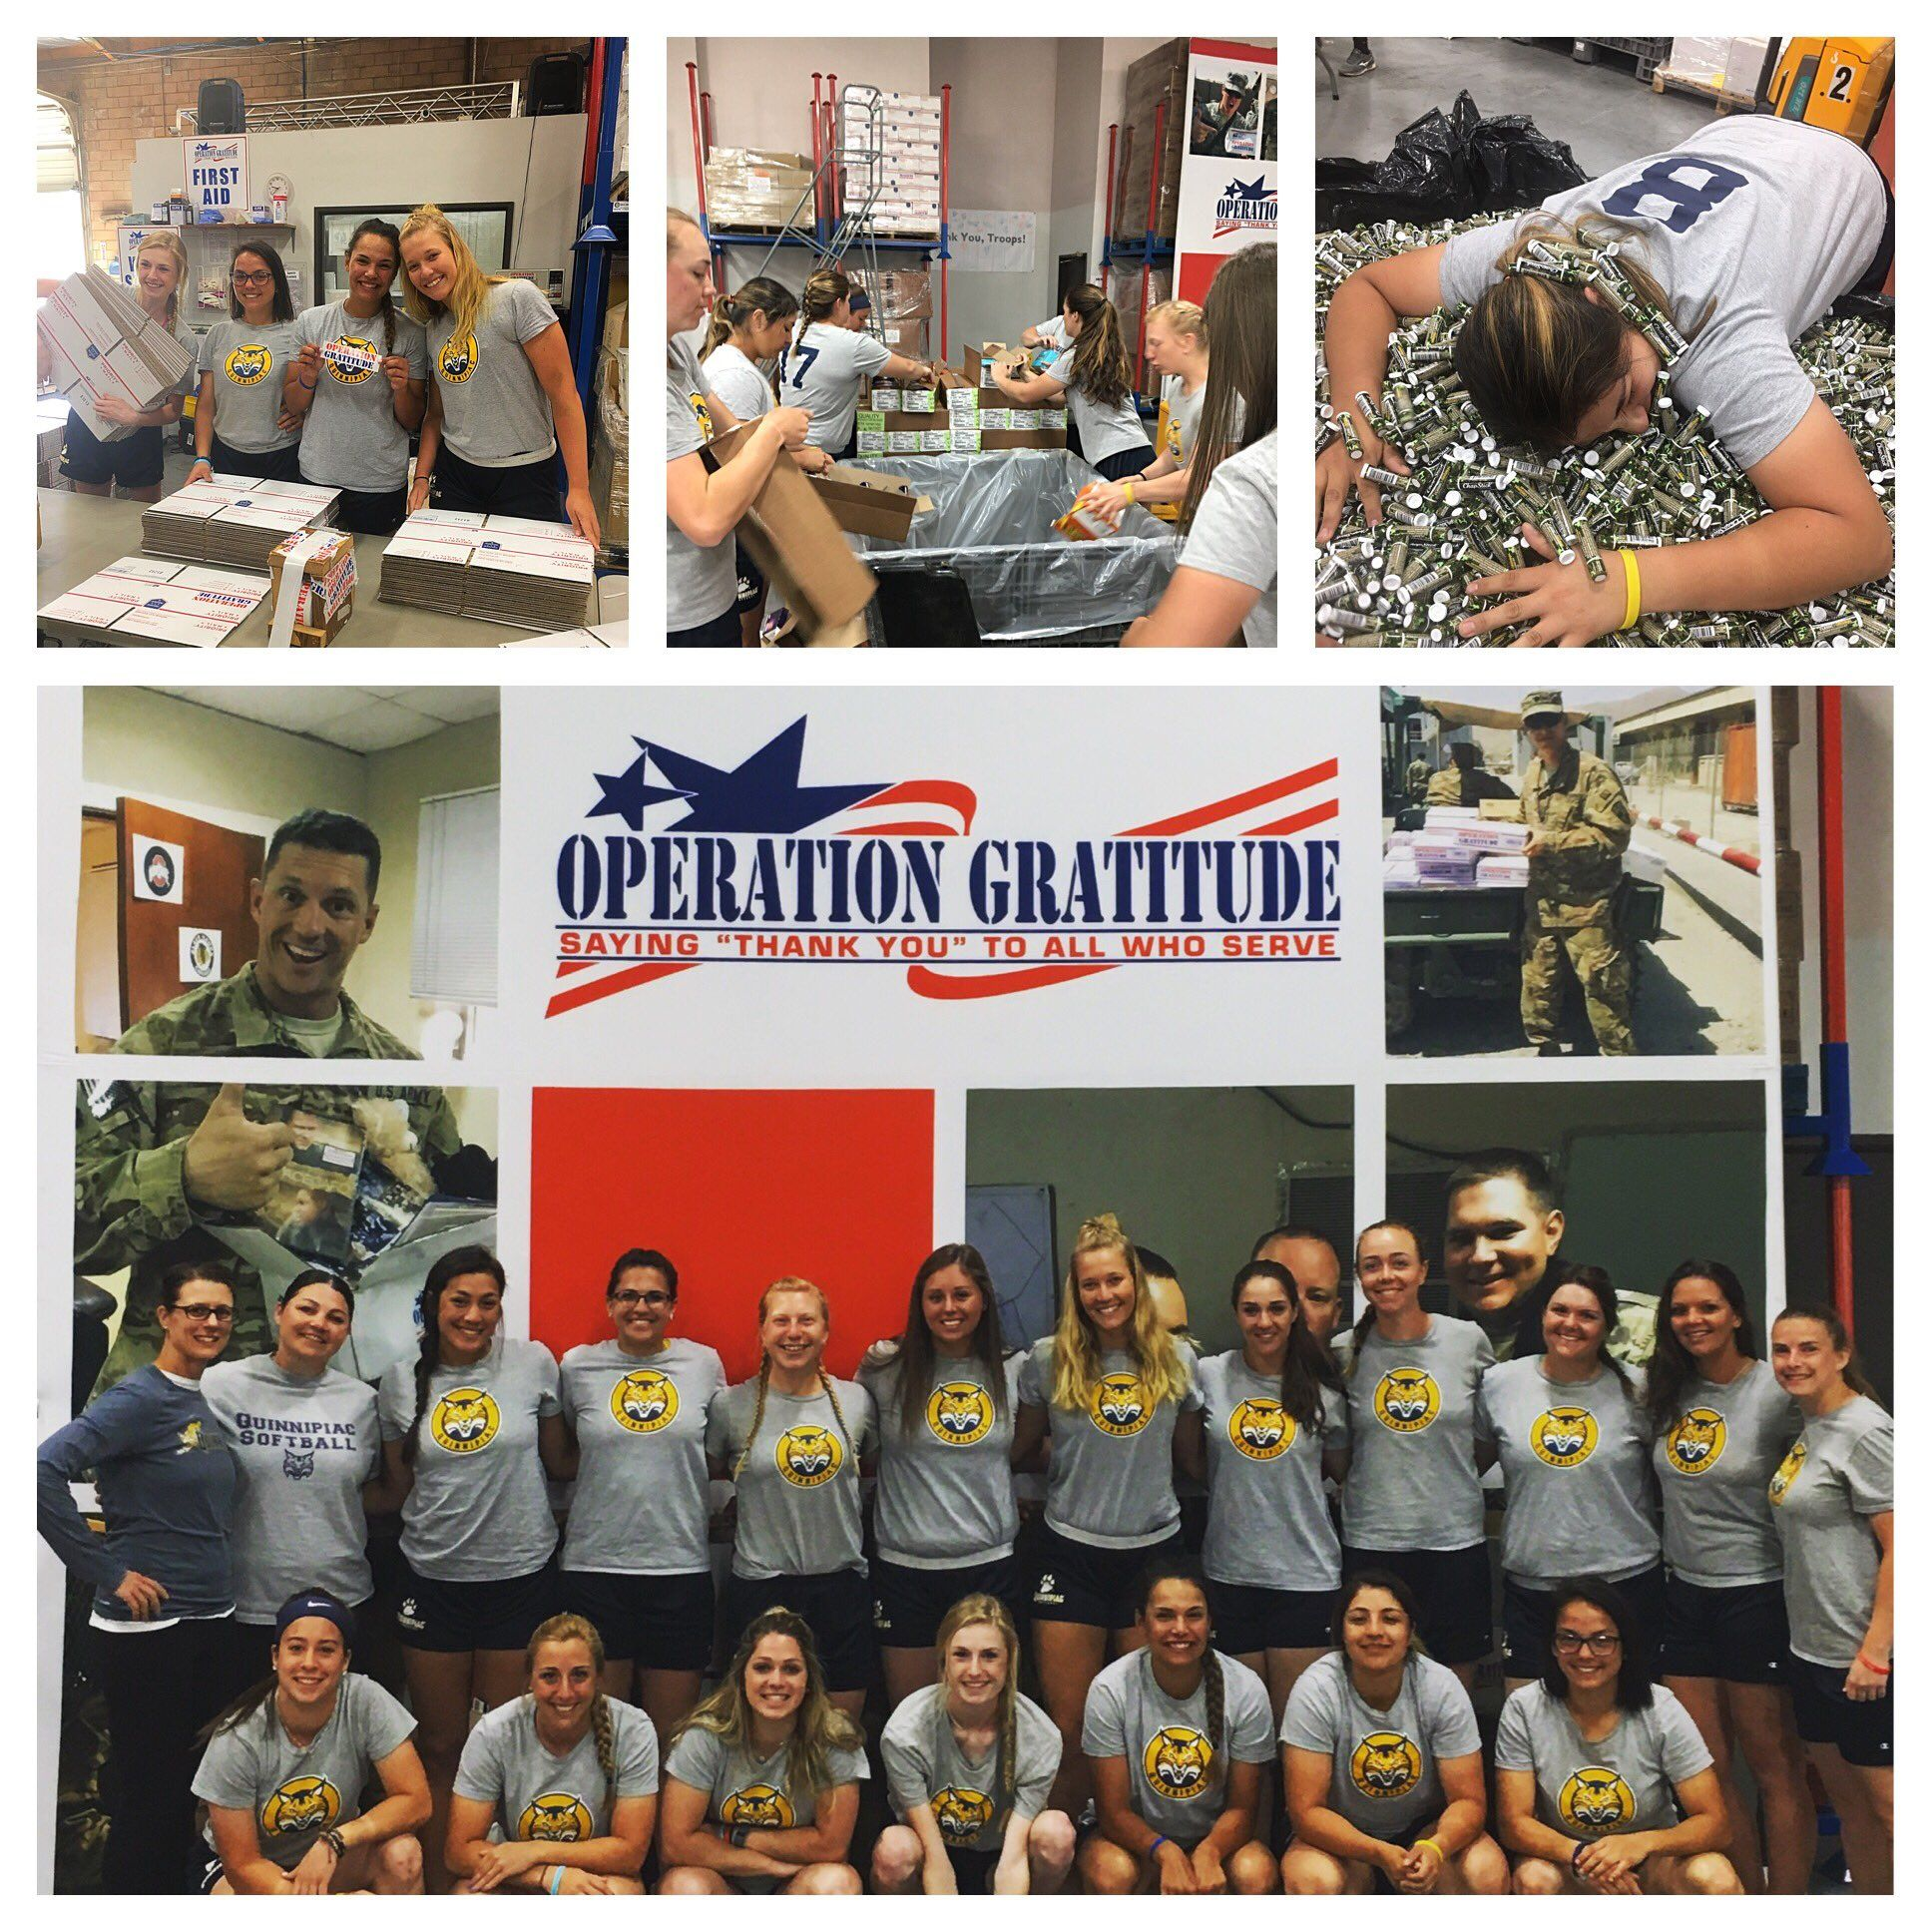 "QUINNIPIAC SOFTBALL: ""#OperationGratitude success! Giving back @OpGratitude having an #attitudeofgratitude thanking all those that serve today."""